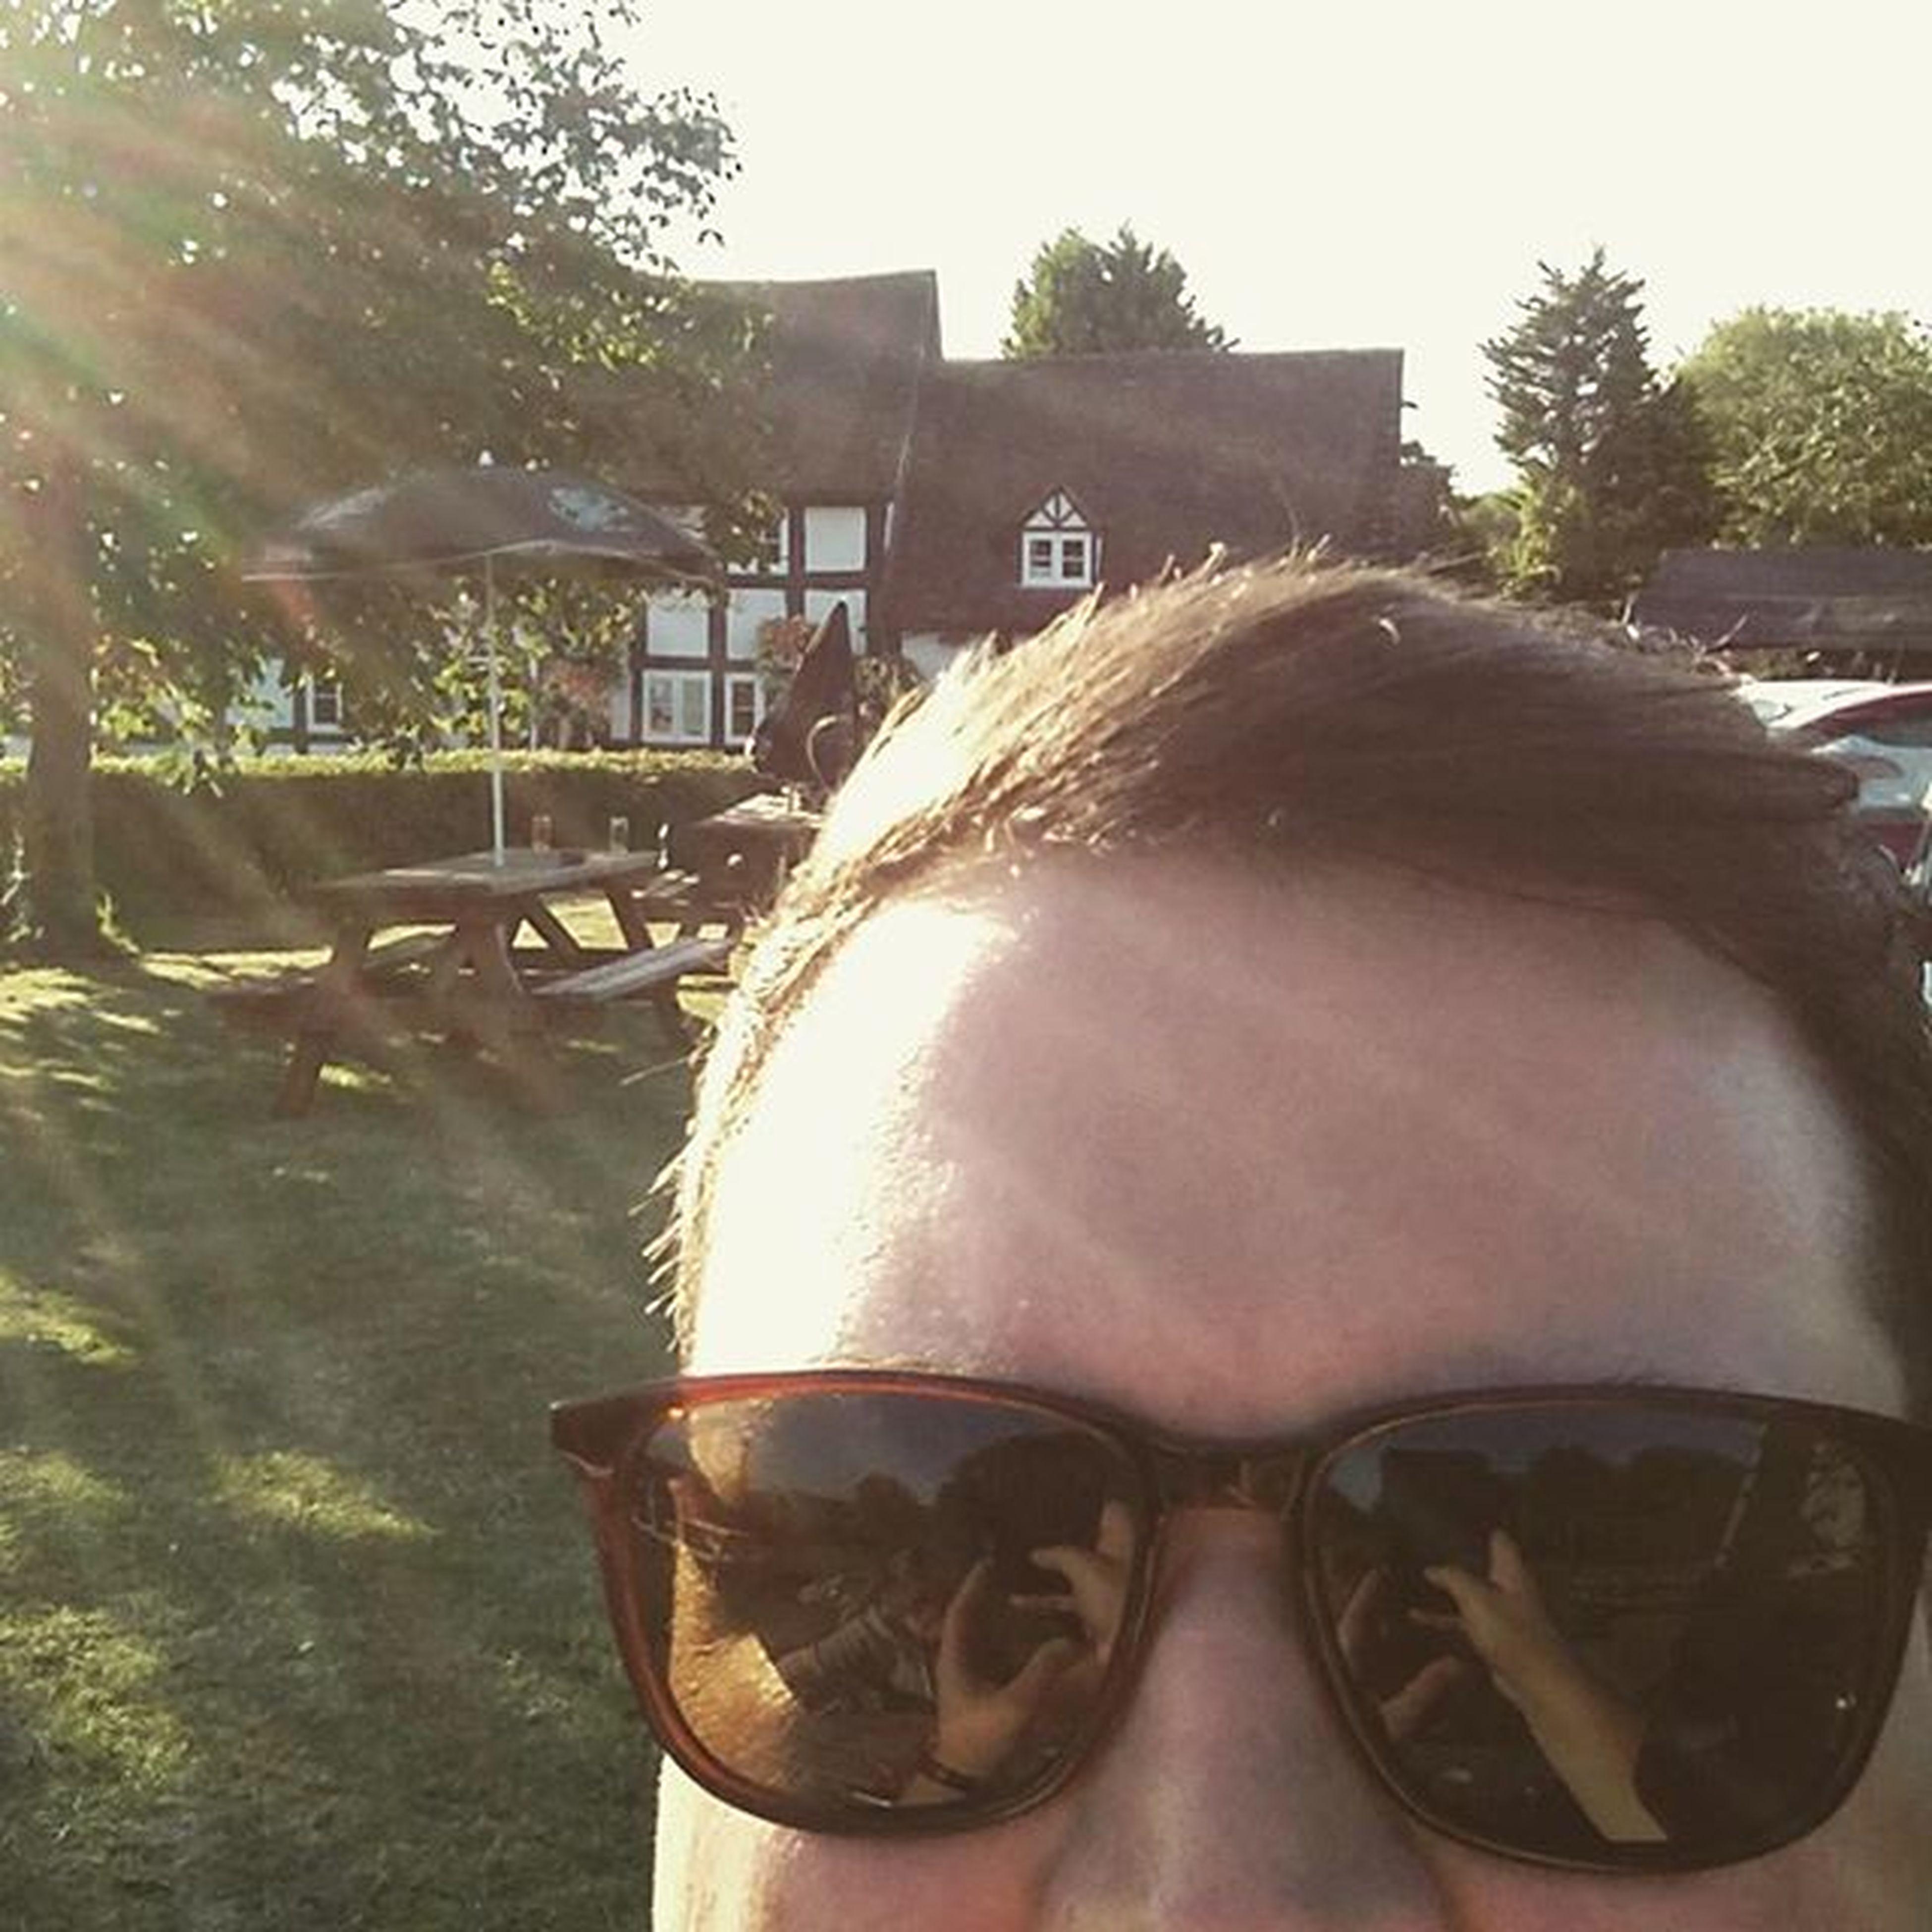 What more do you need? Coldbeer Beergarden  Sunshine Summerevening Quiteliketolivehere Crownandrose Severnstoke